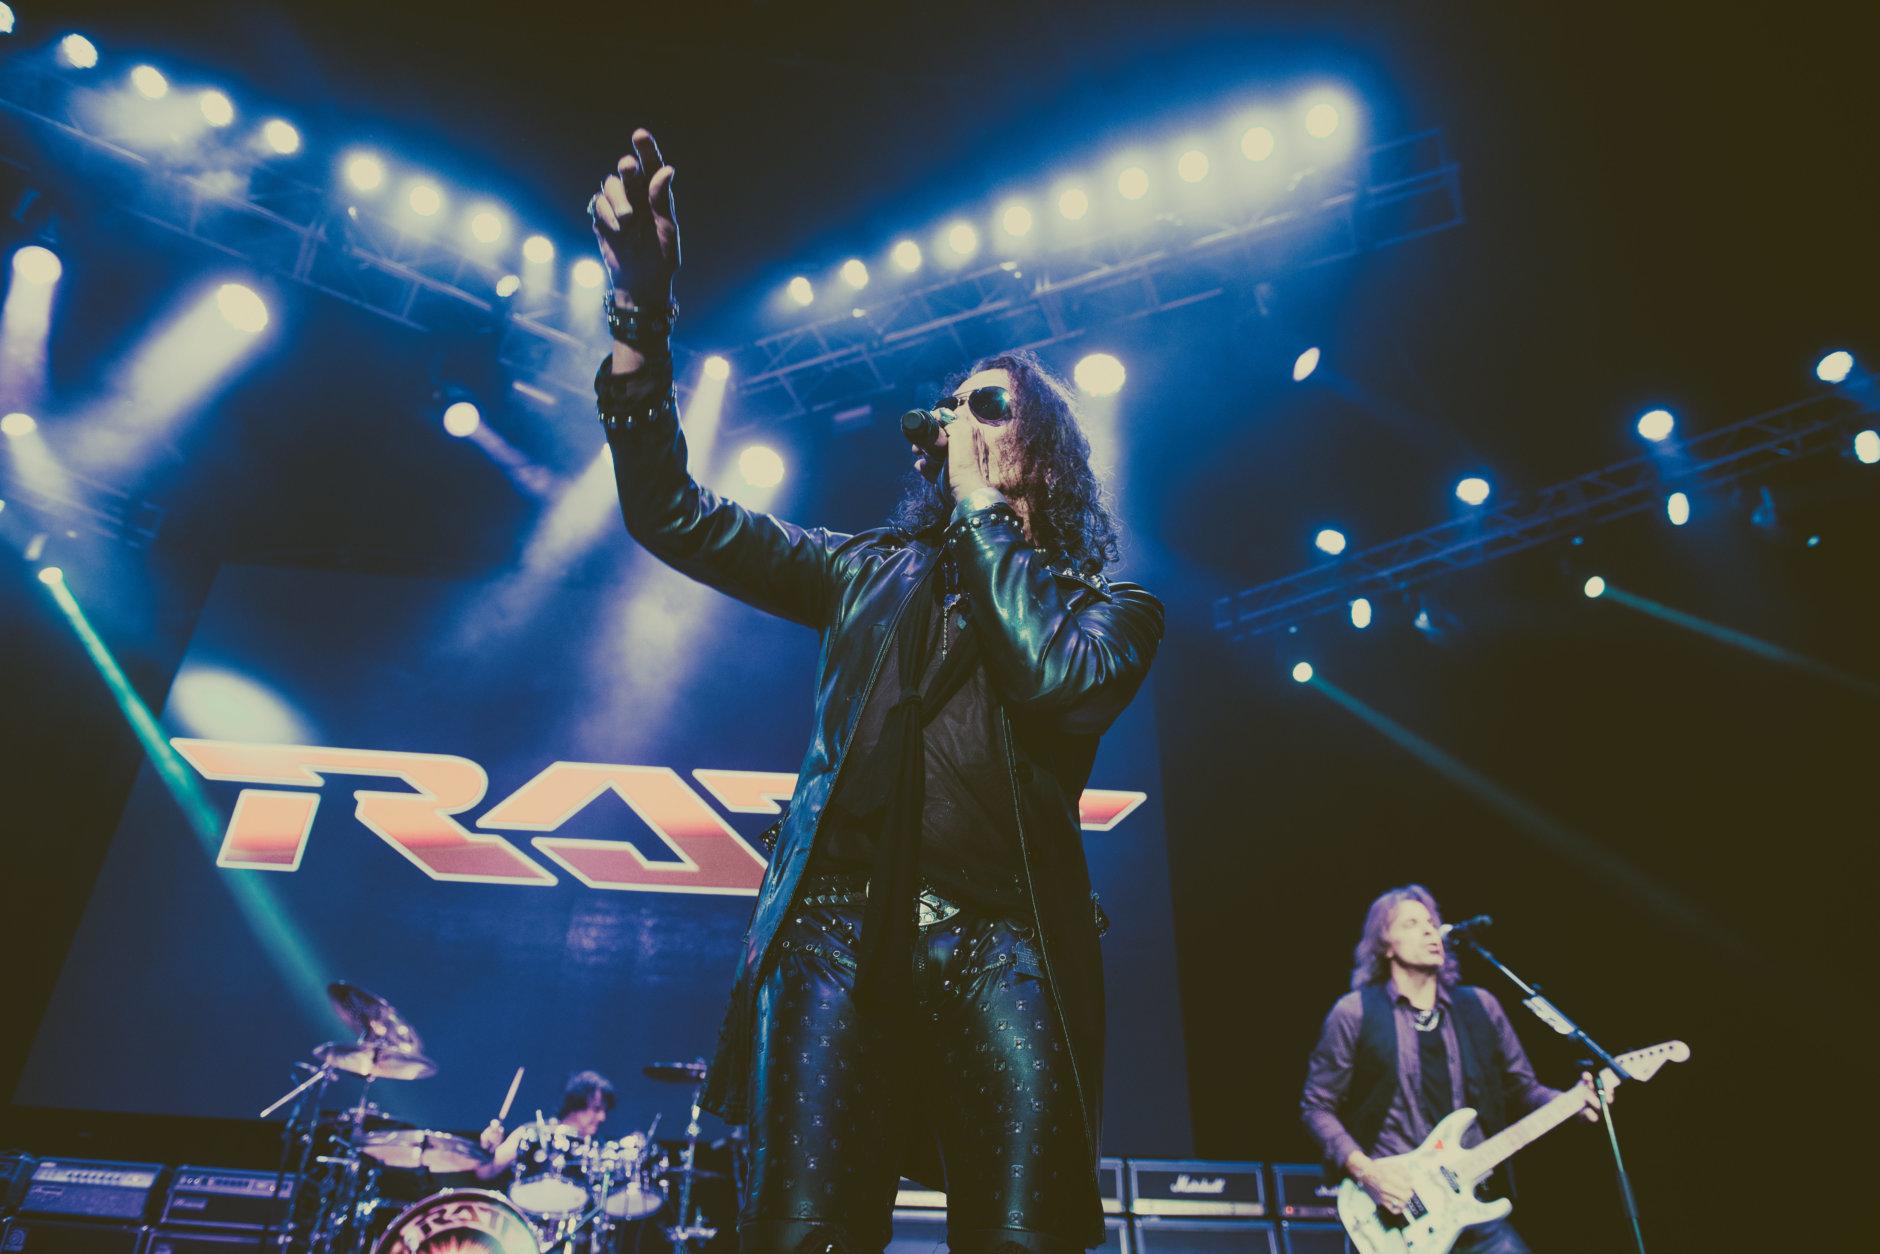 Ratt at M3 Rock Festival. (Dave Barnhouser 13th Hour Photography)